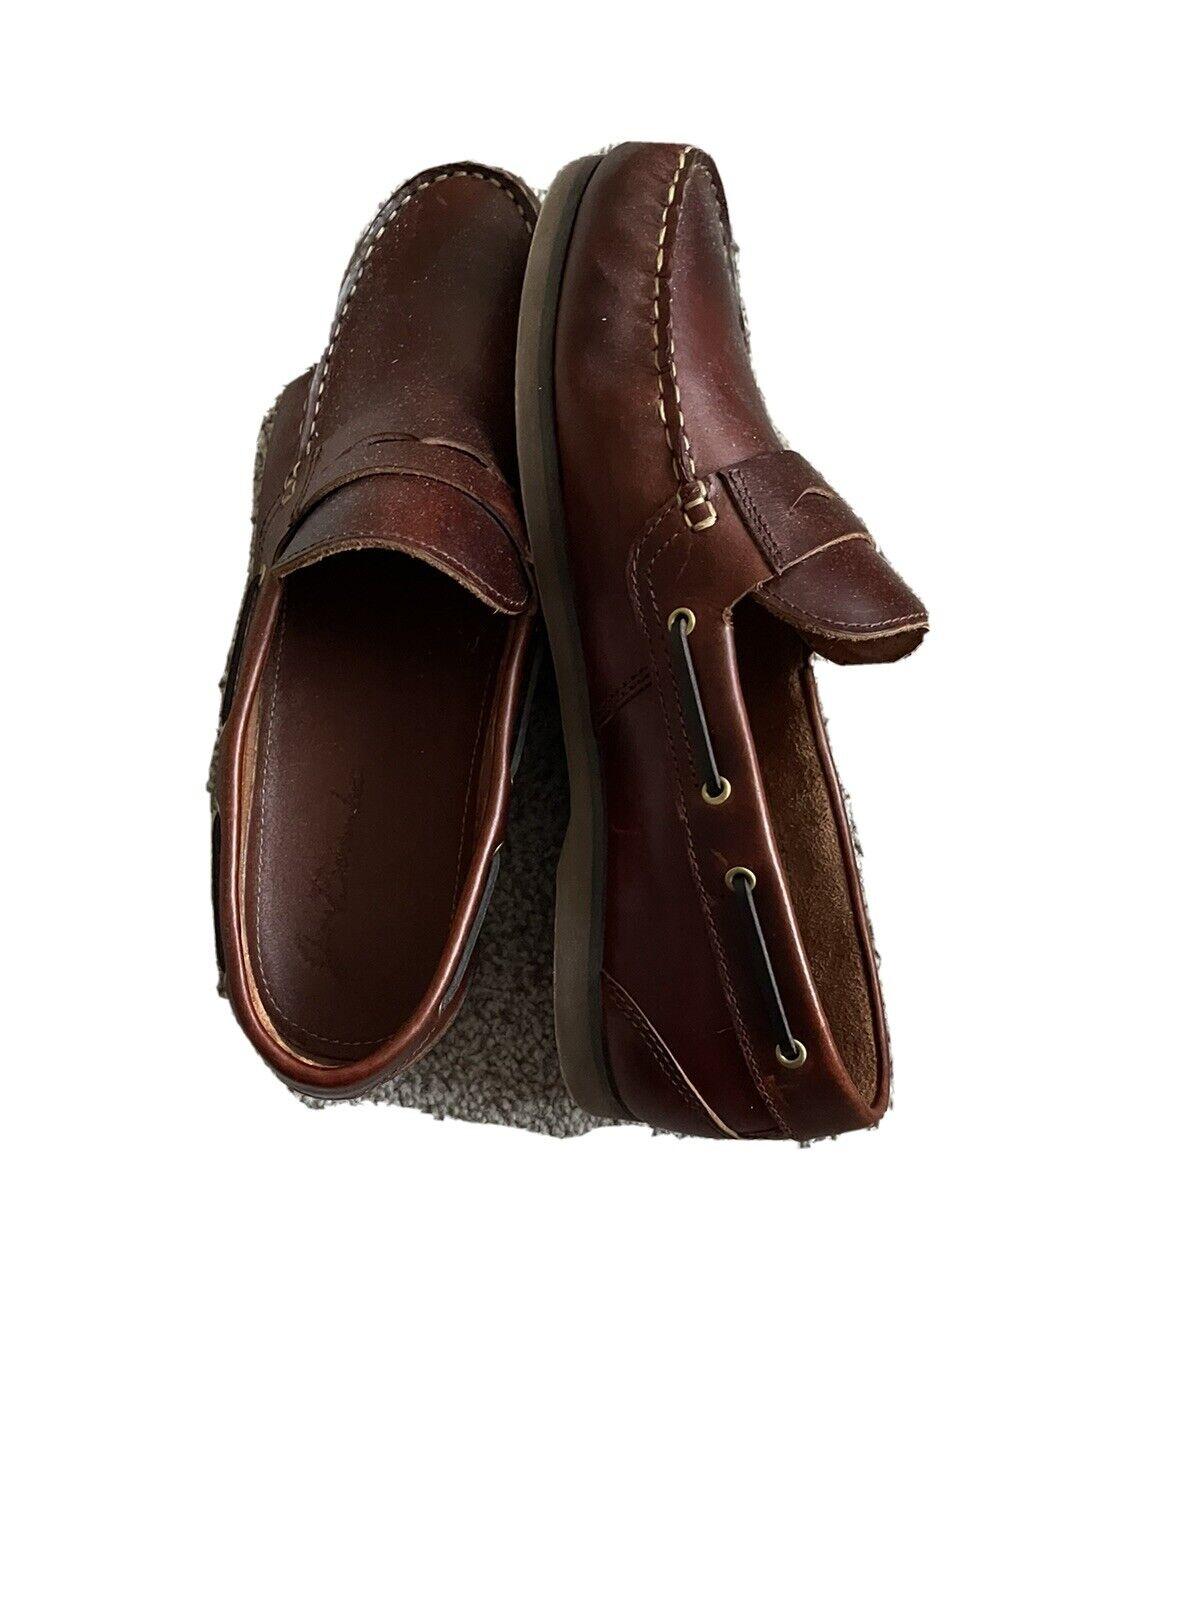 JIM BOOMBA Slip on Boat Shoes - Premium Leather Slip-on Deck Shoes - Mahogany